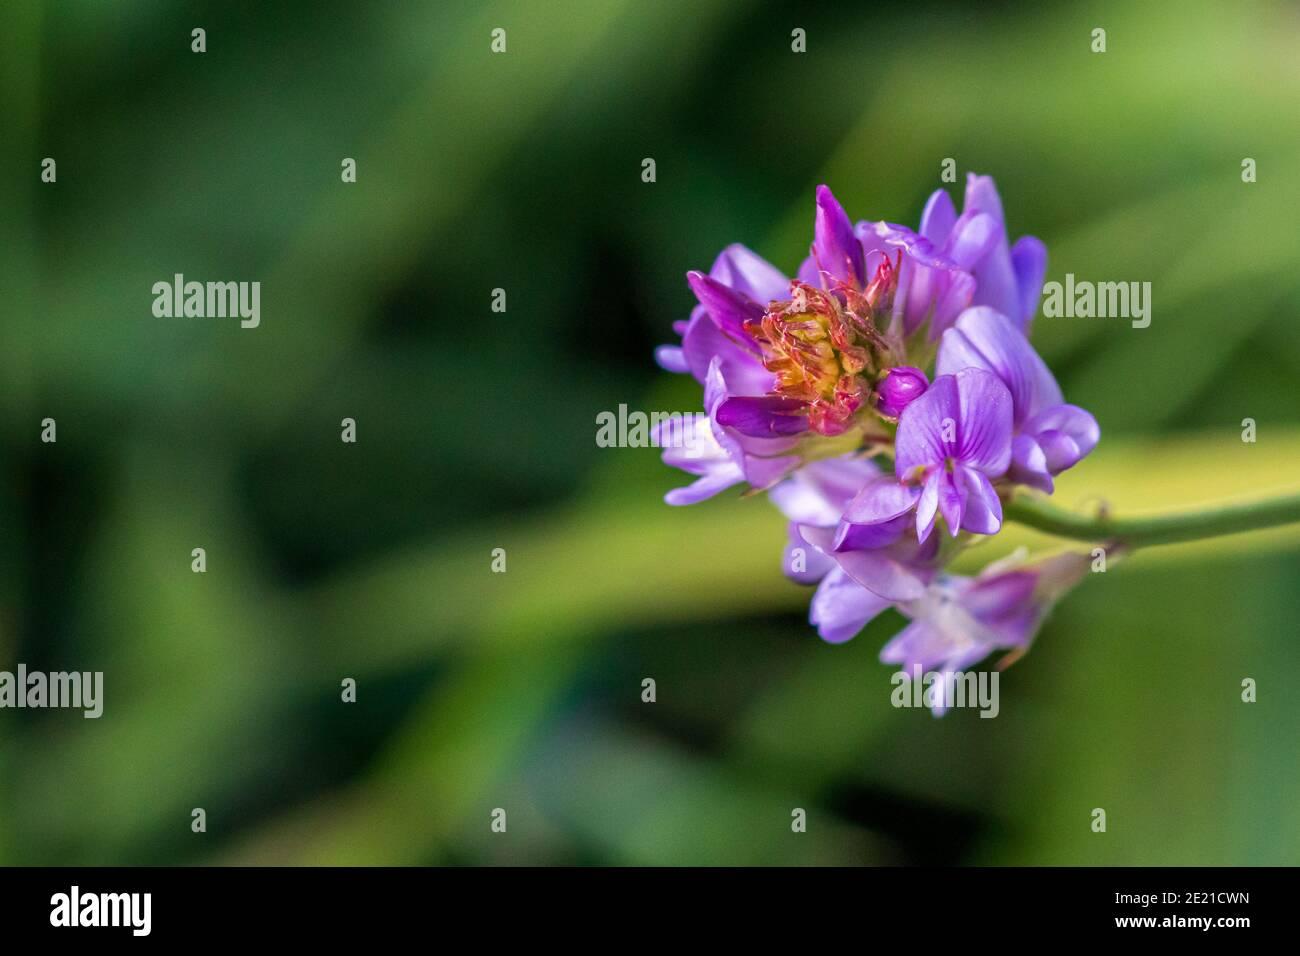 Bituminaria bituminosa, Arabian Pea Plant in Flower Stock Photo